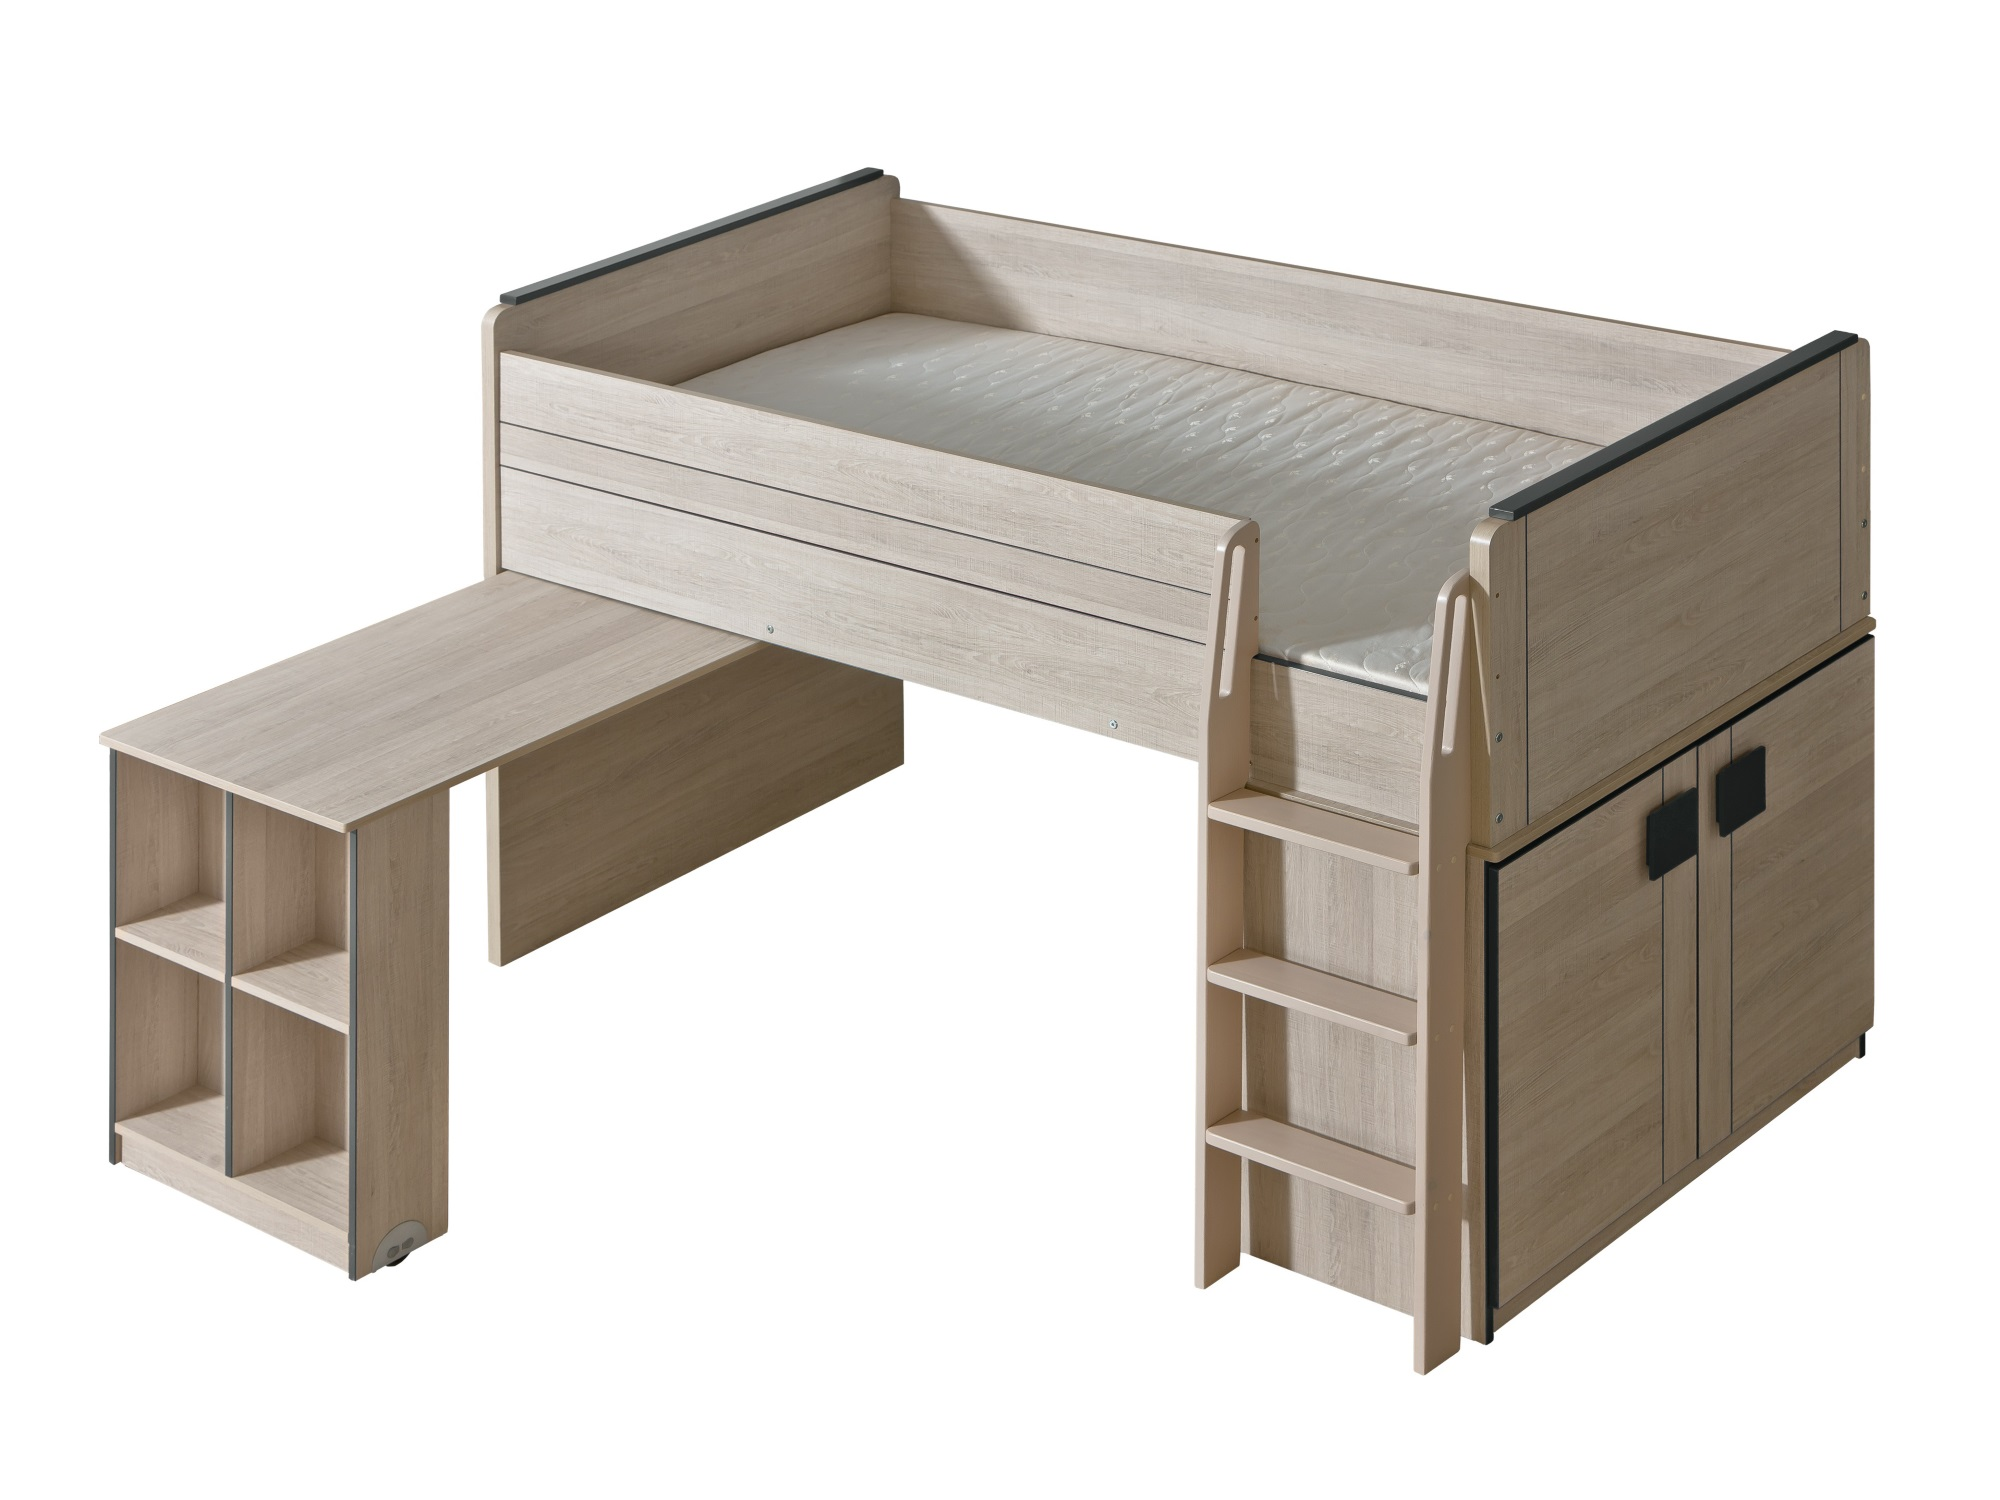 Dolmar Vyvýšená postel Gumi G15 s výsuvným stolkem